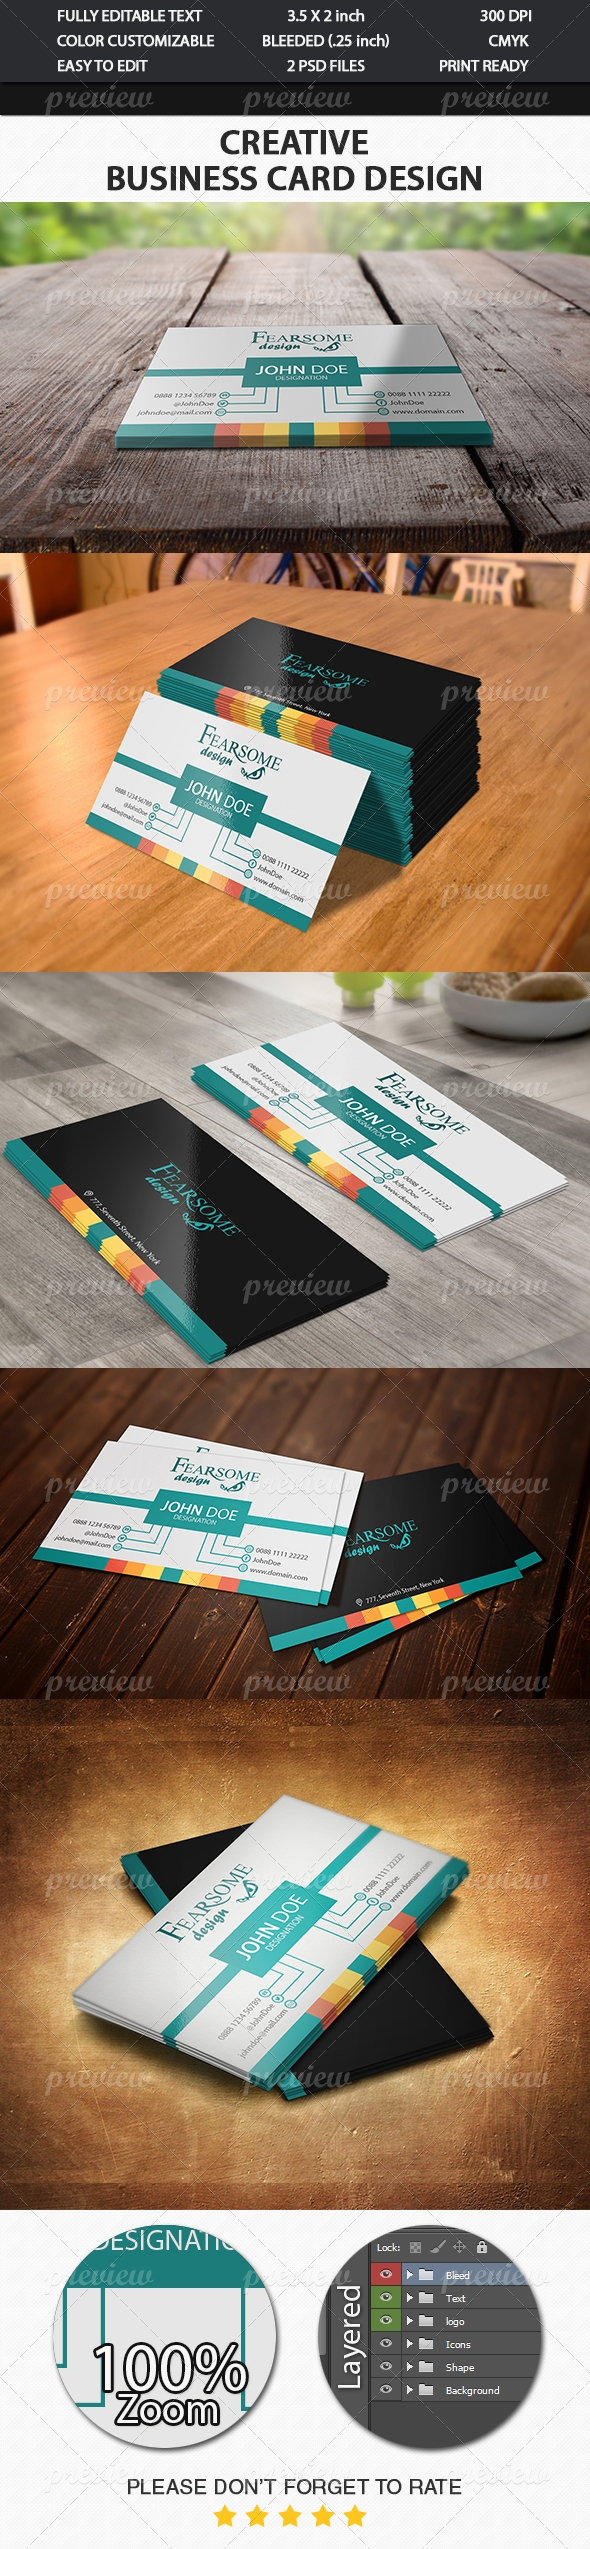 Creative Business Card 8